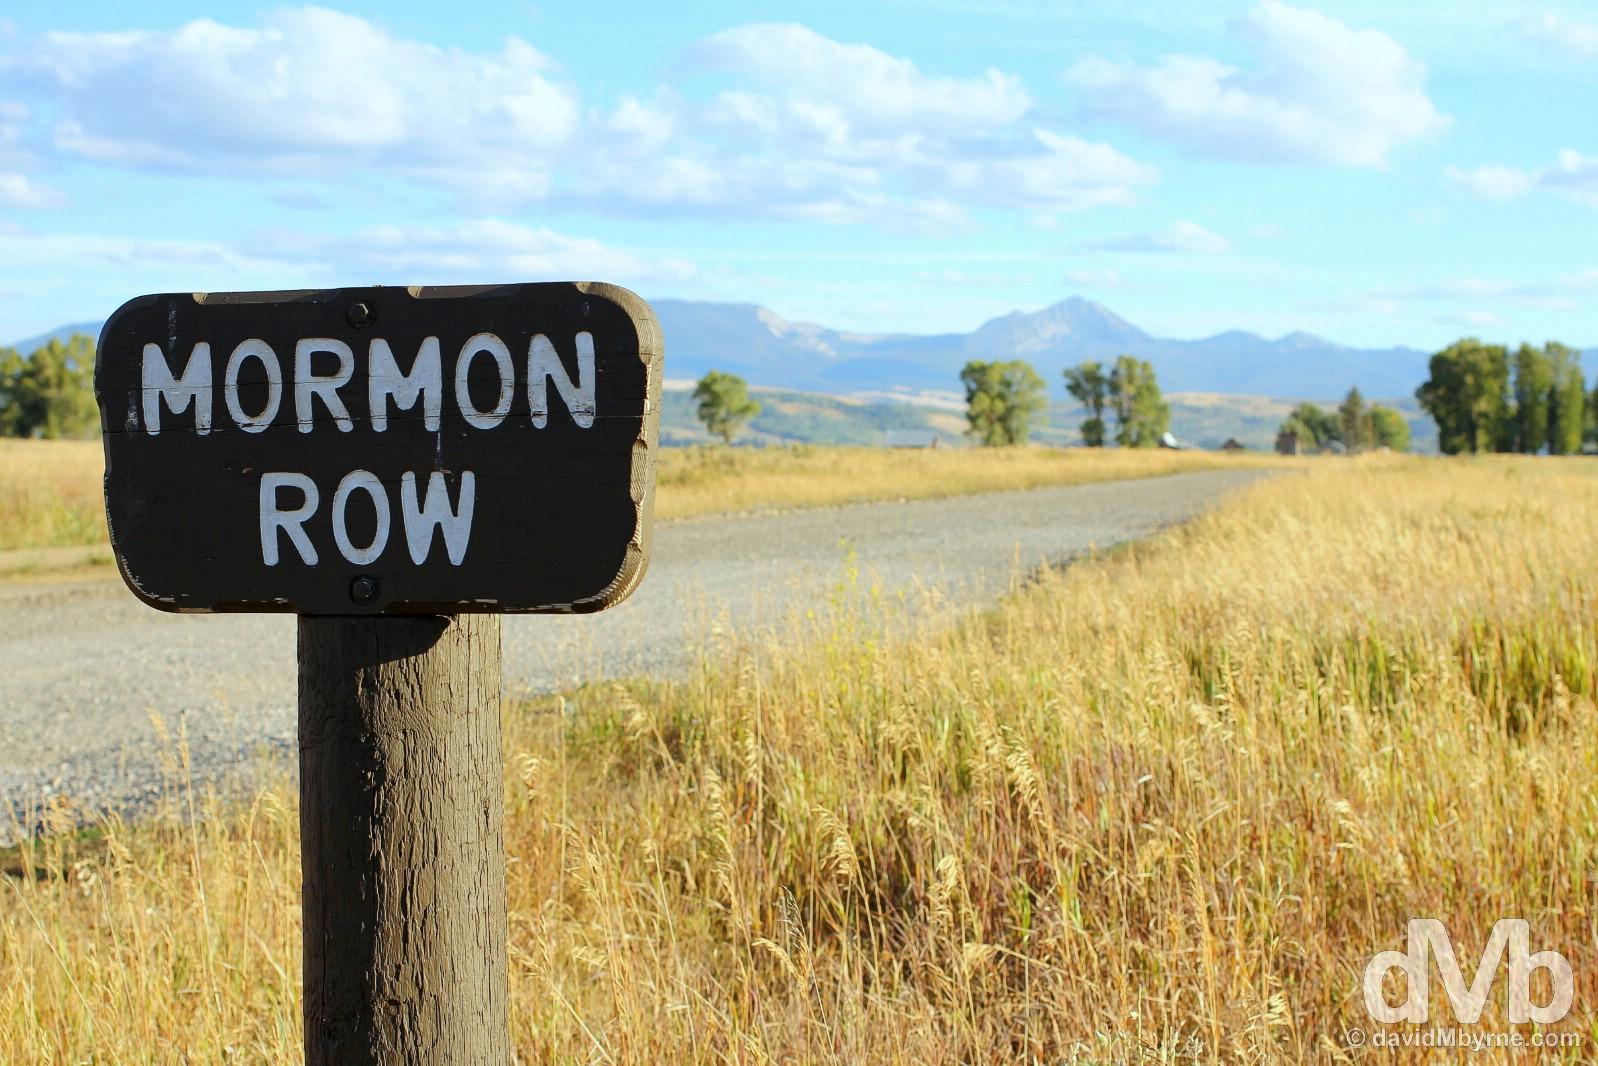 Mormon Row, Grand Teton National Park, Wyoming, USA. September 5, 2016.